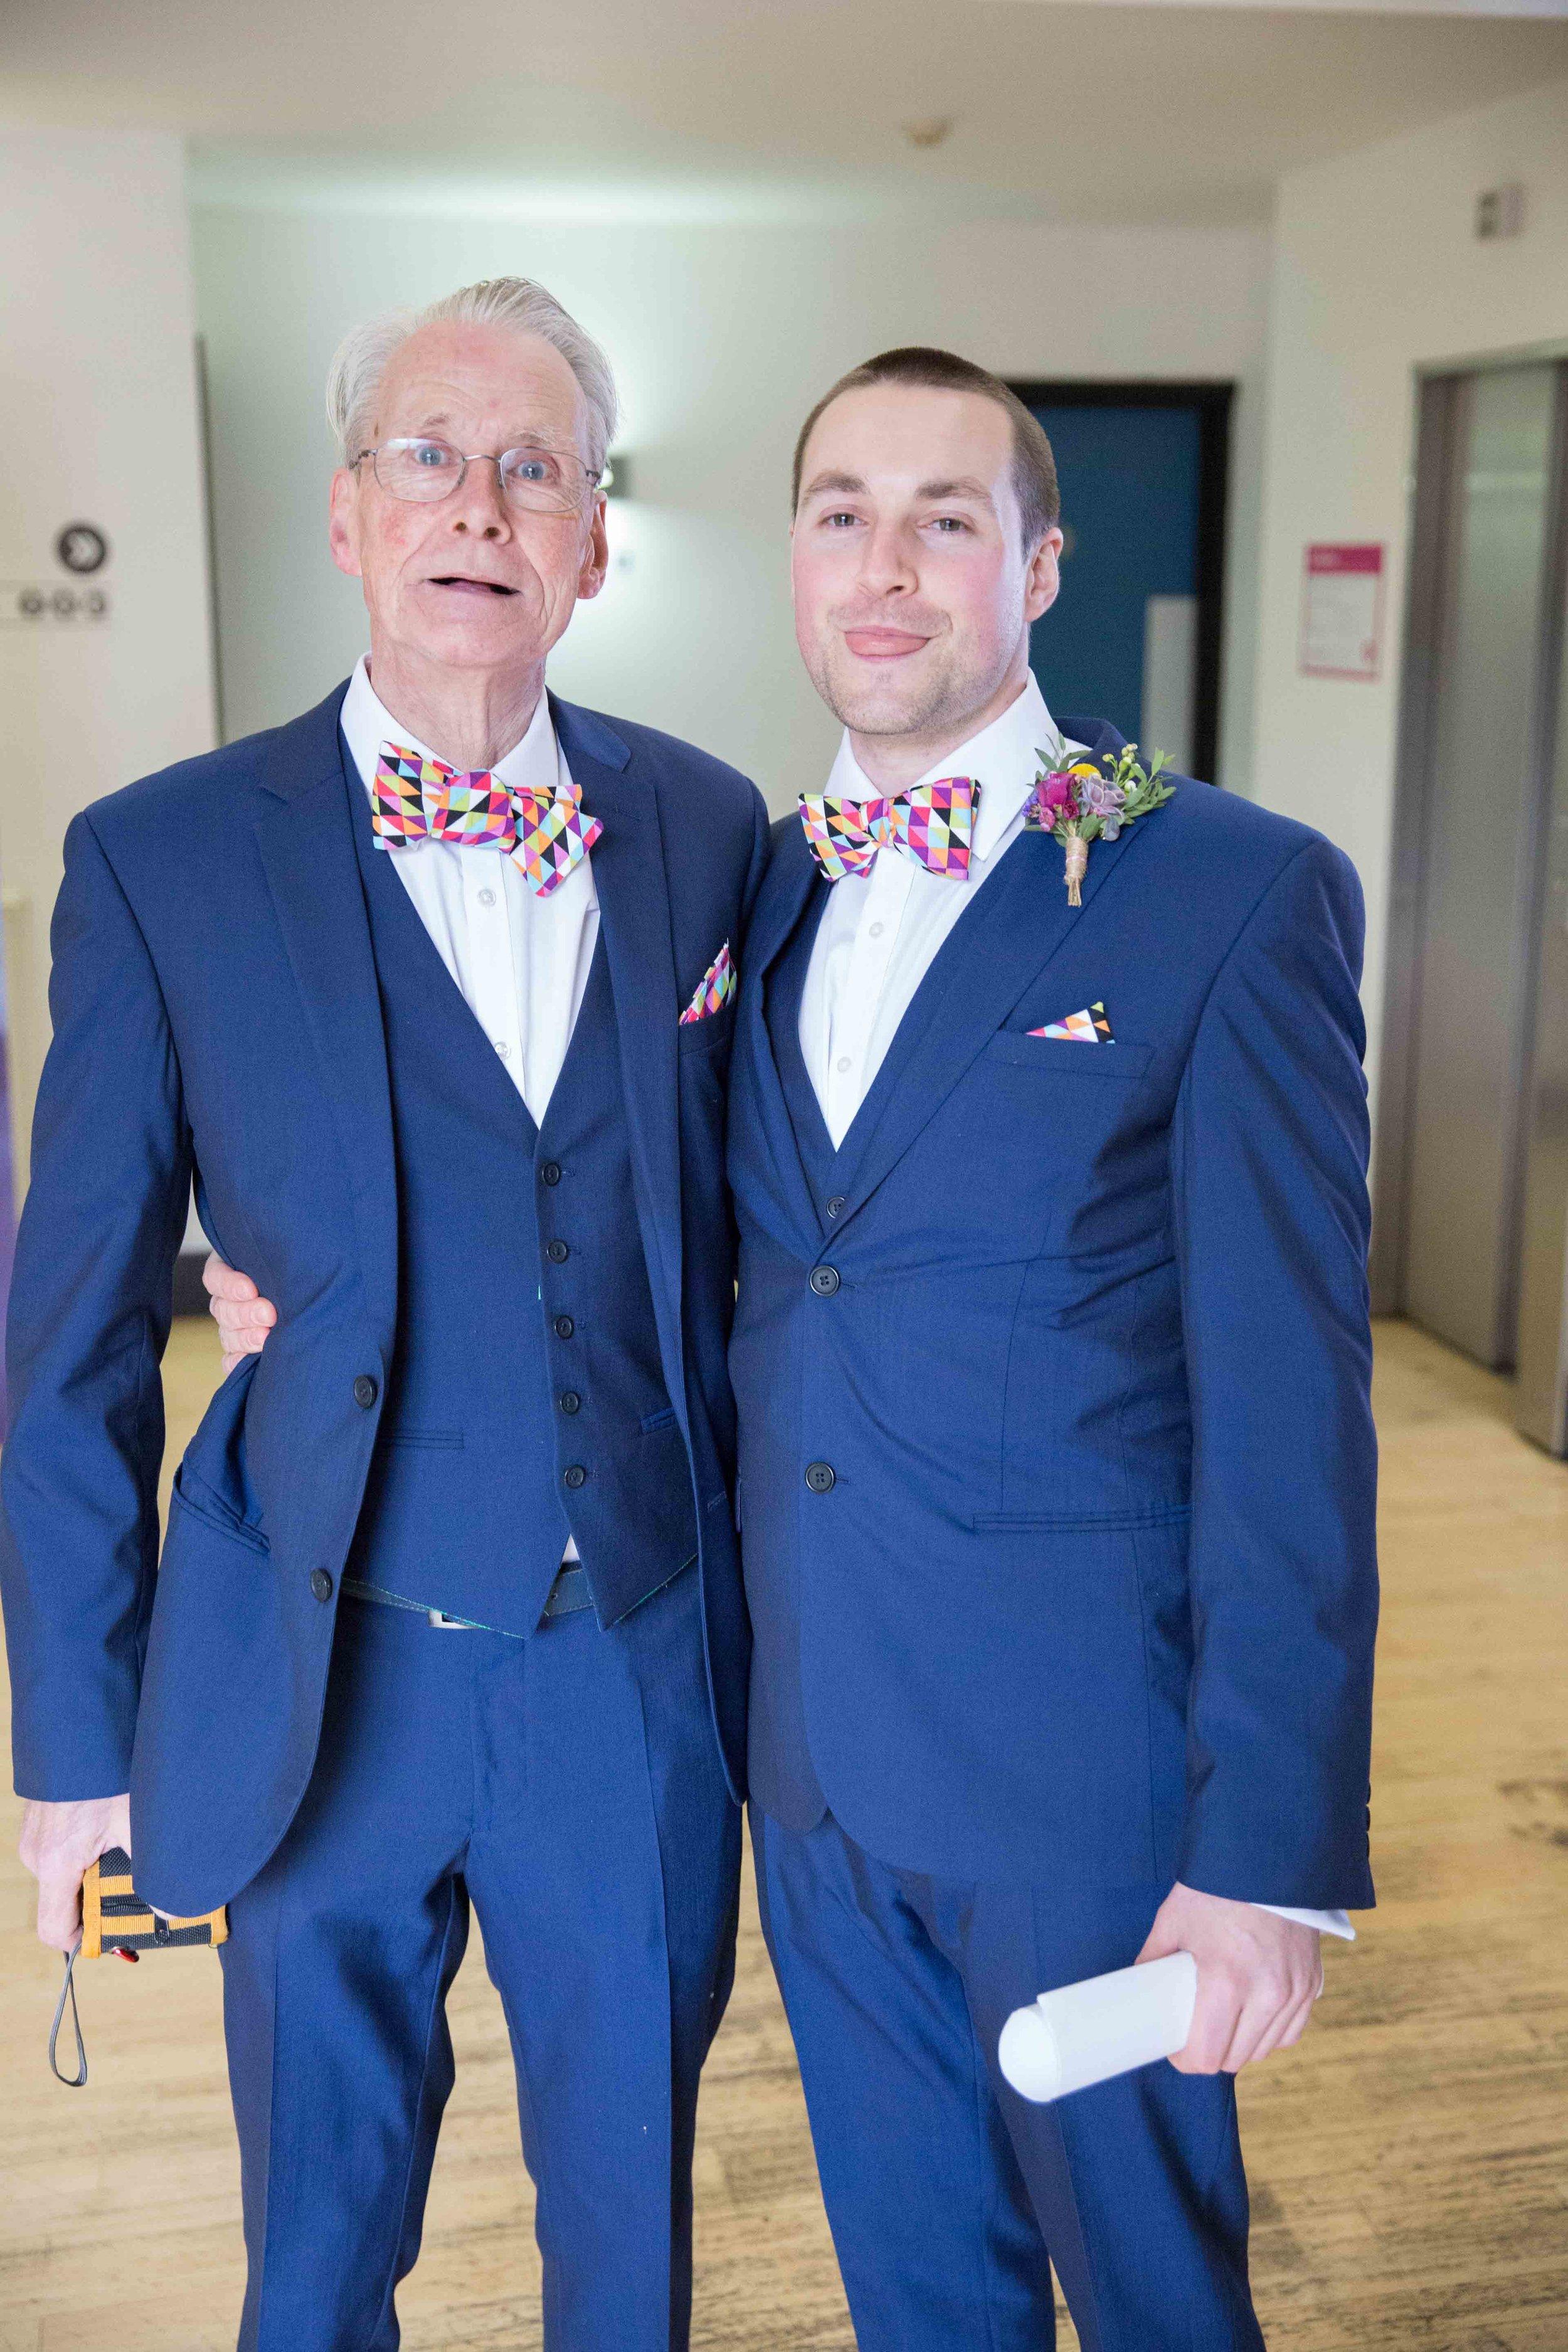 Adam & Faye - Wright Wedding Photography - Bristol Wedding Photographer -42.jpg